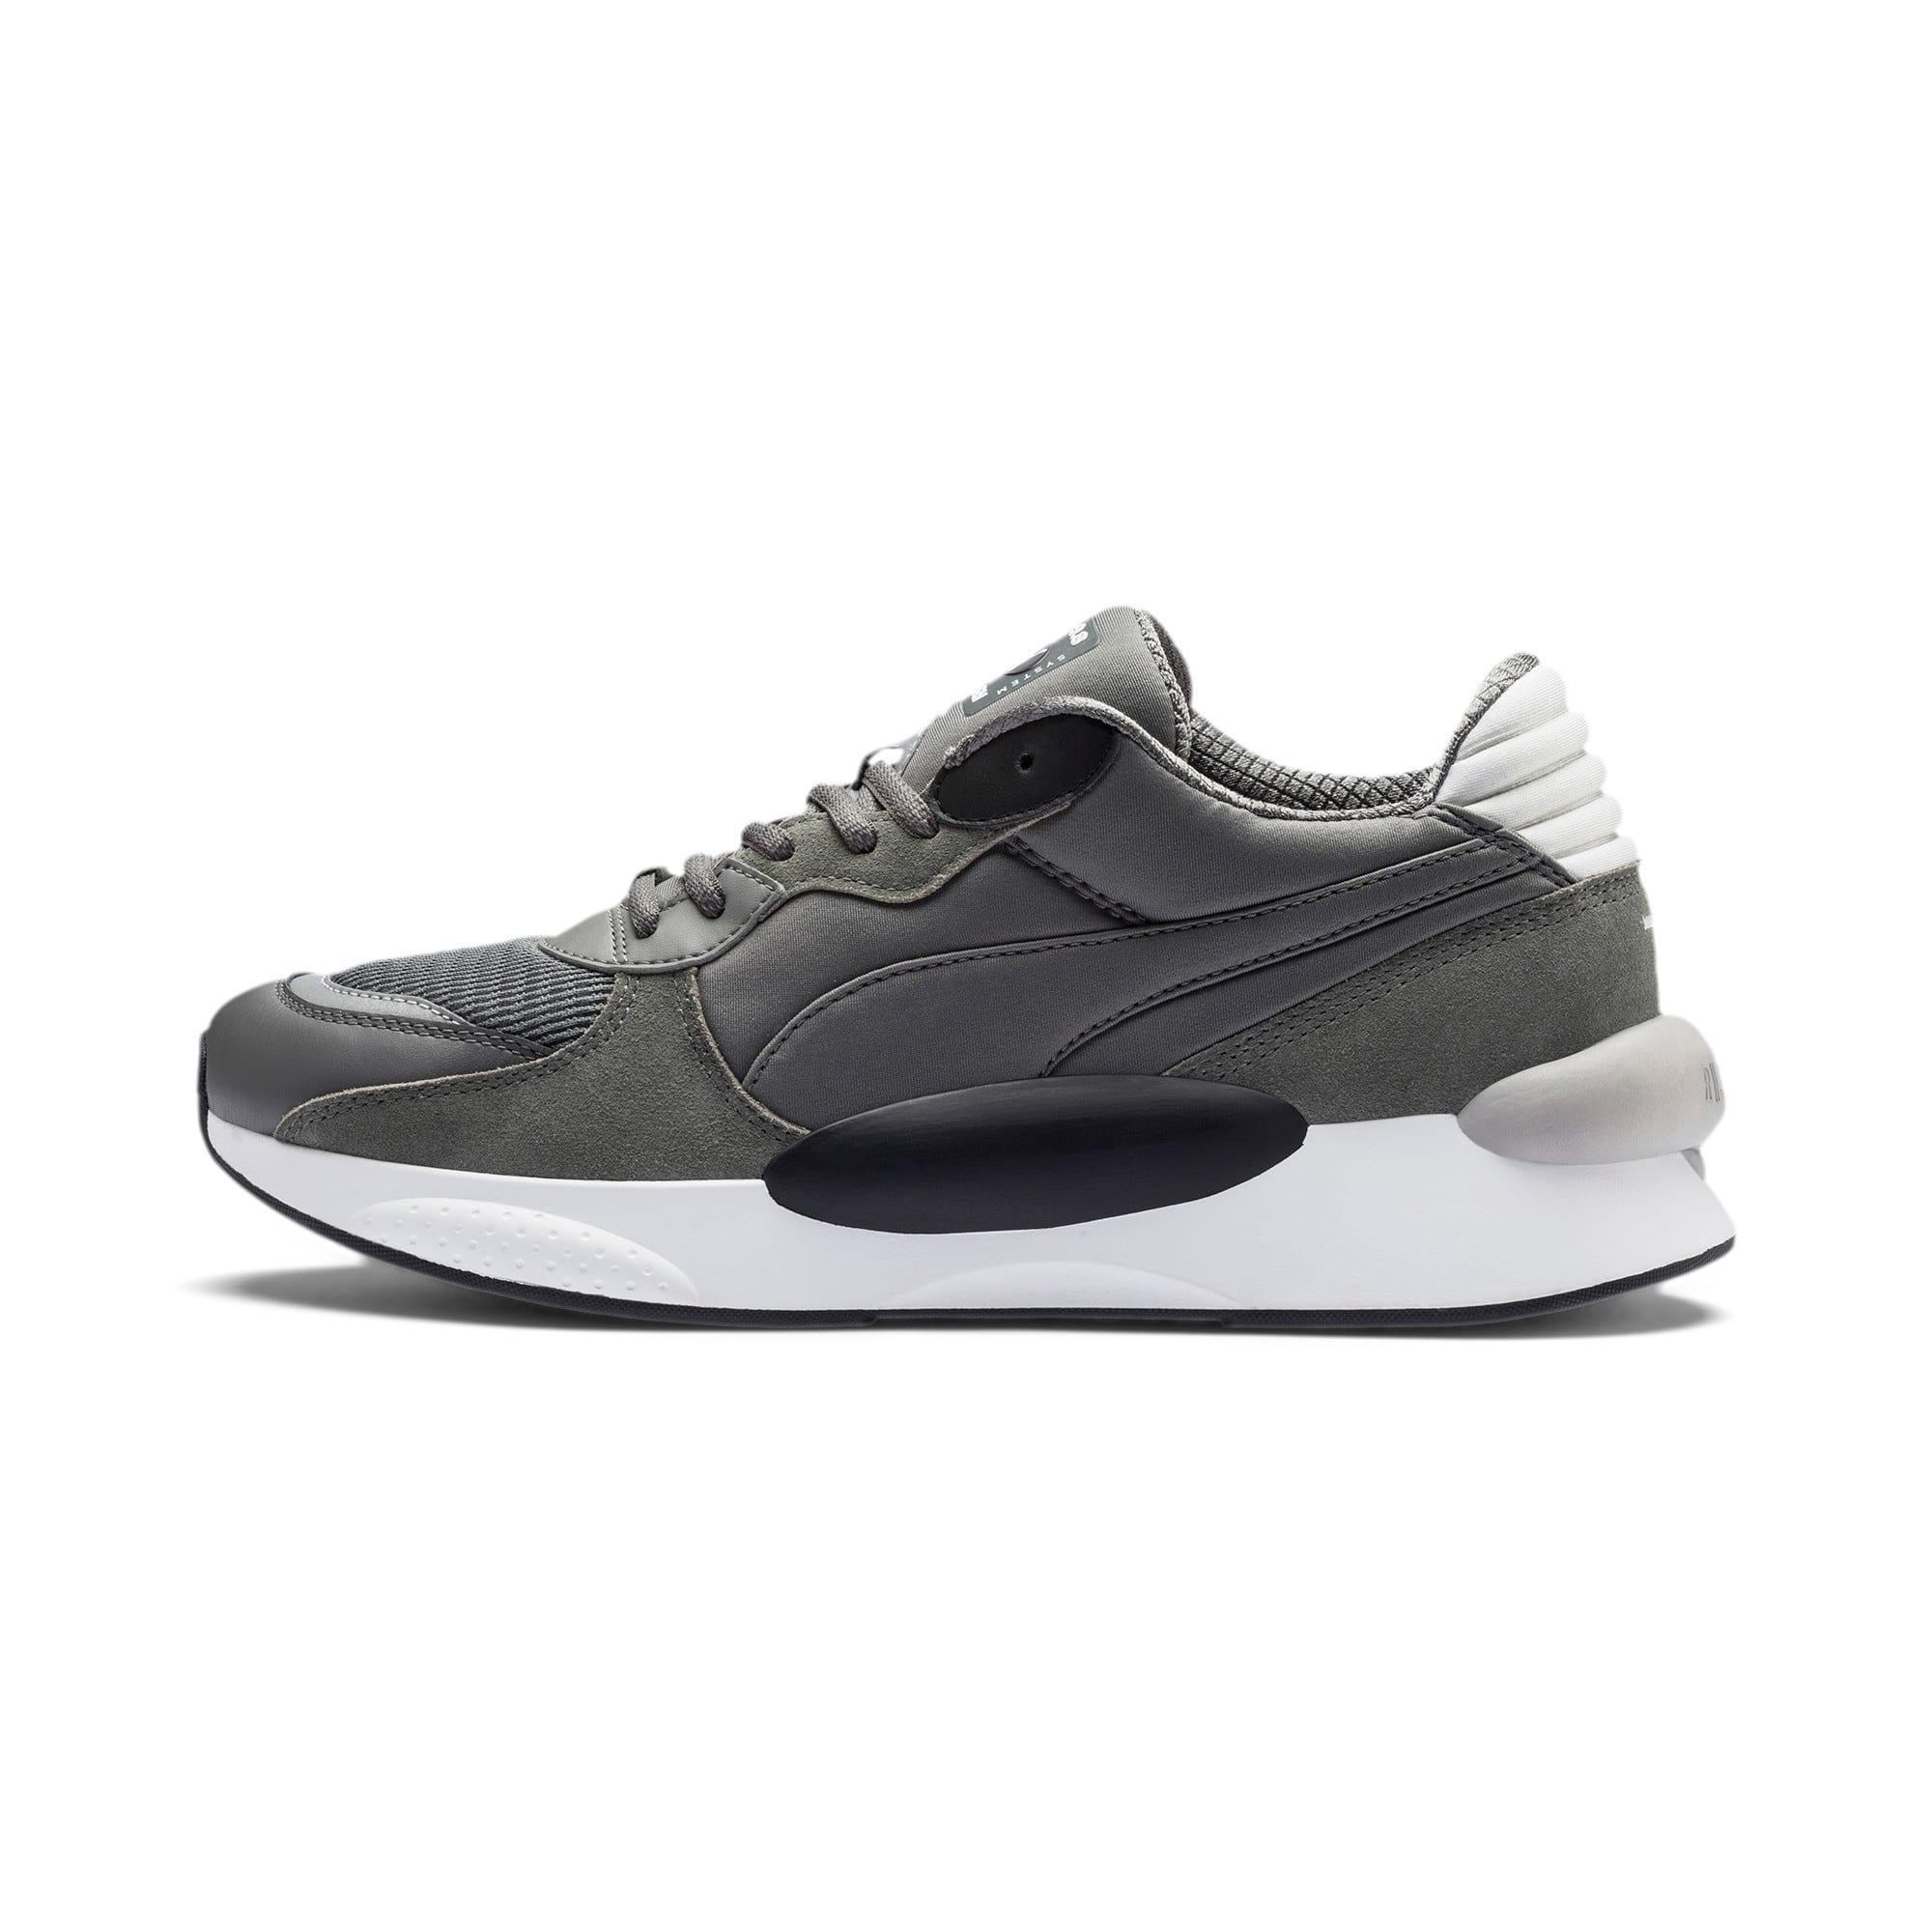 Thumbnail 1 of RS 9.8 Gravity Sneakers, CASTLEROCK-Puma Black, medium